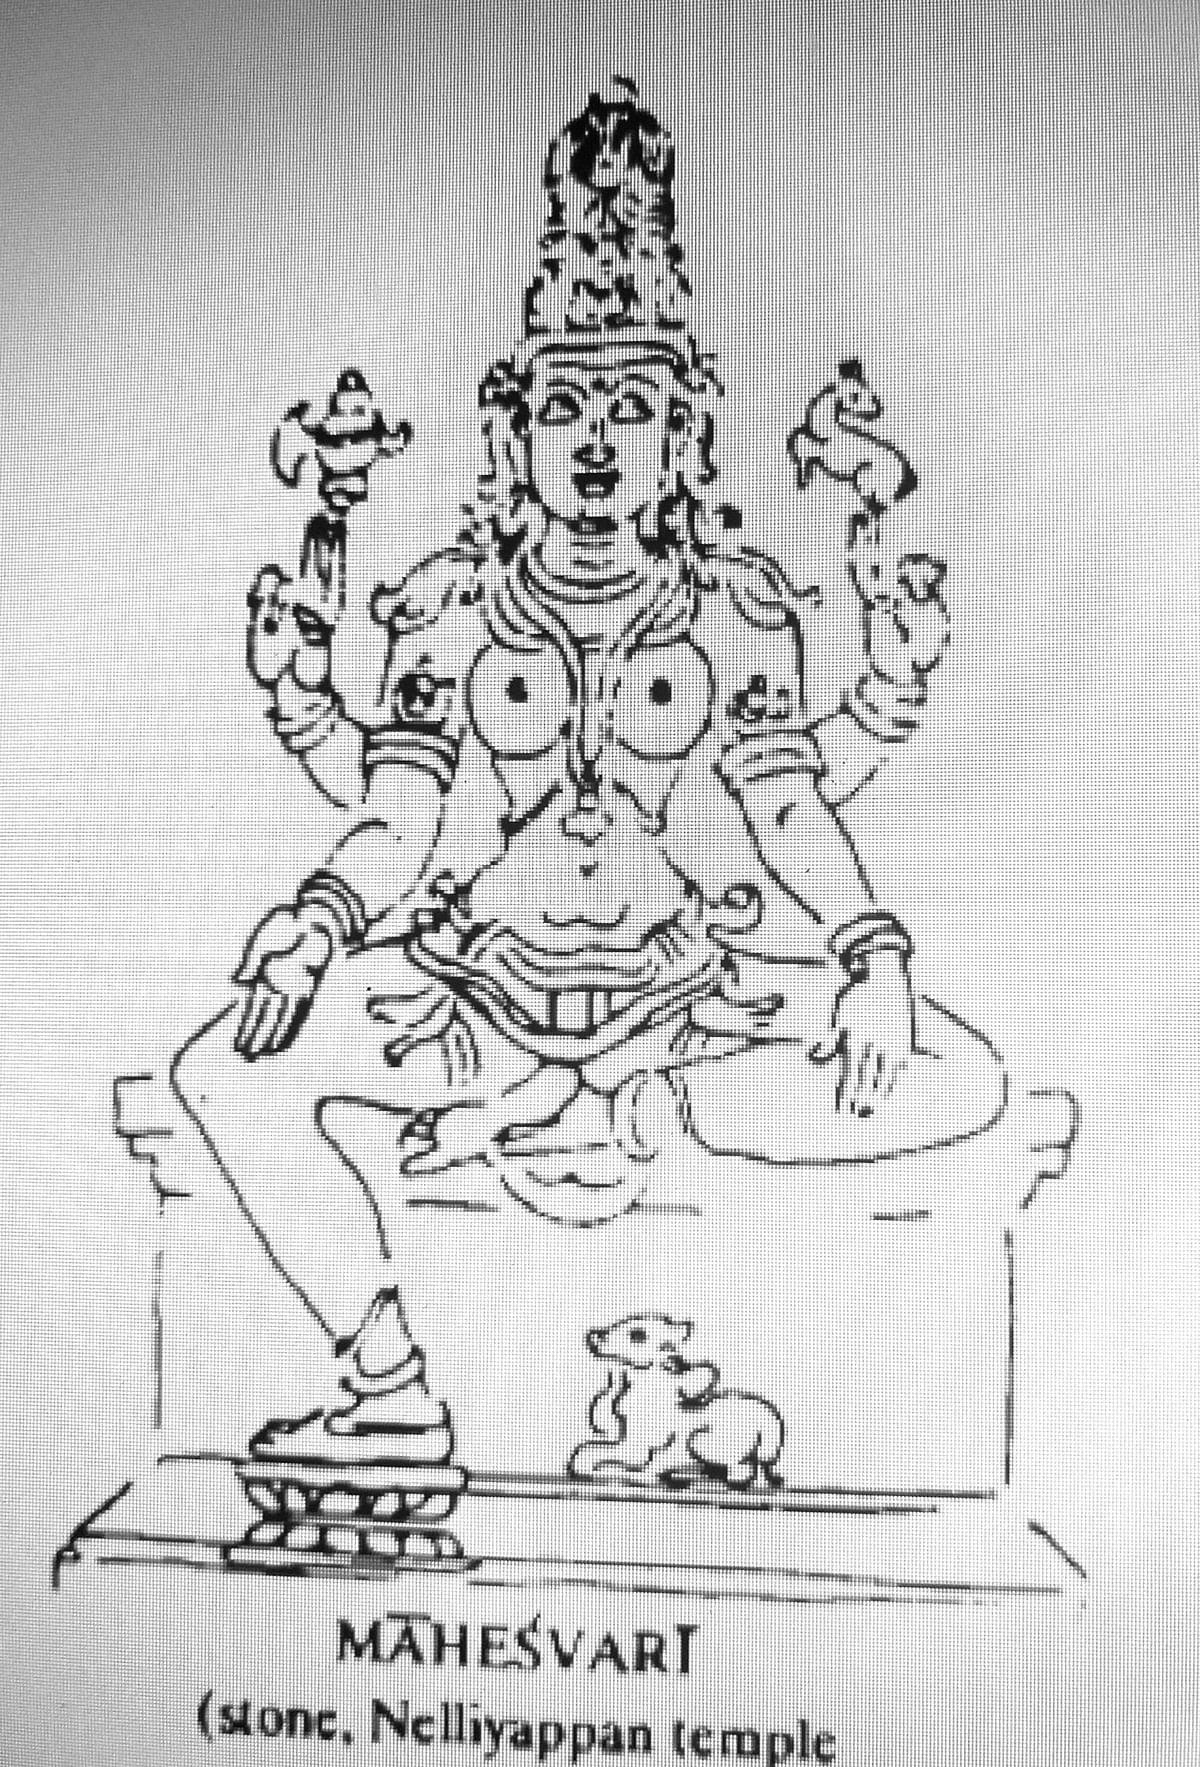 Line drawng of Goddess Maheshwari from 'Pratima Kosh'.